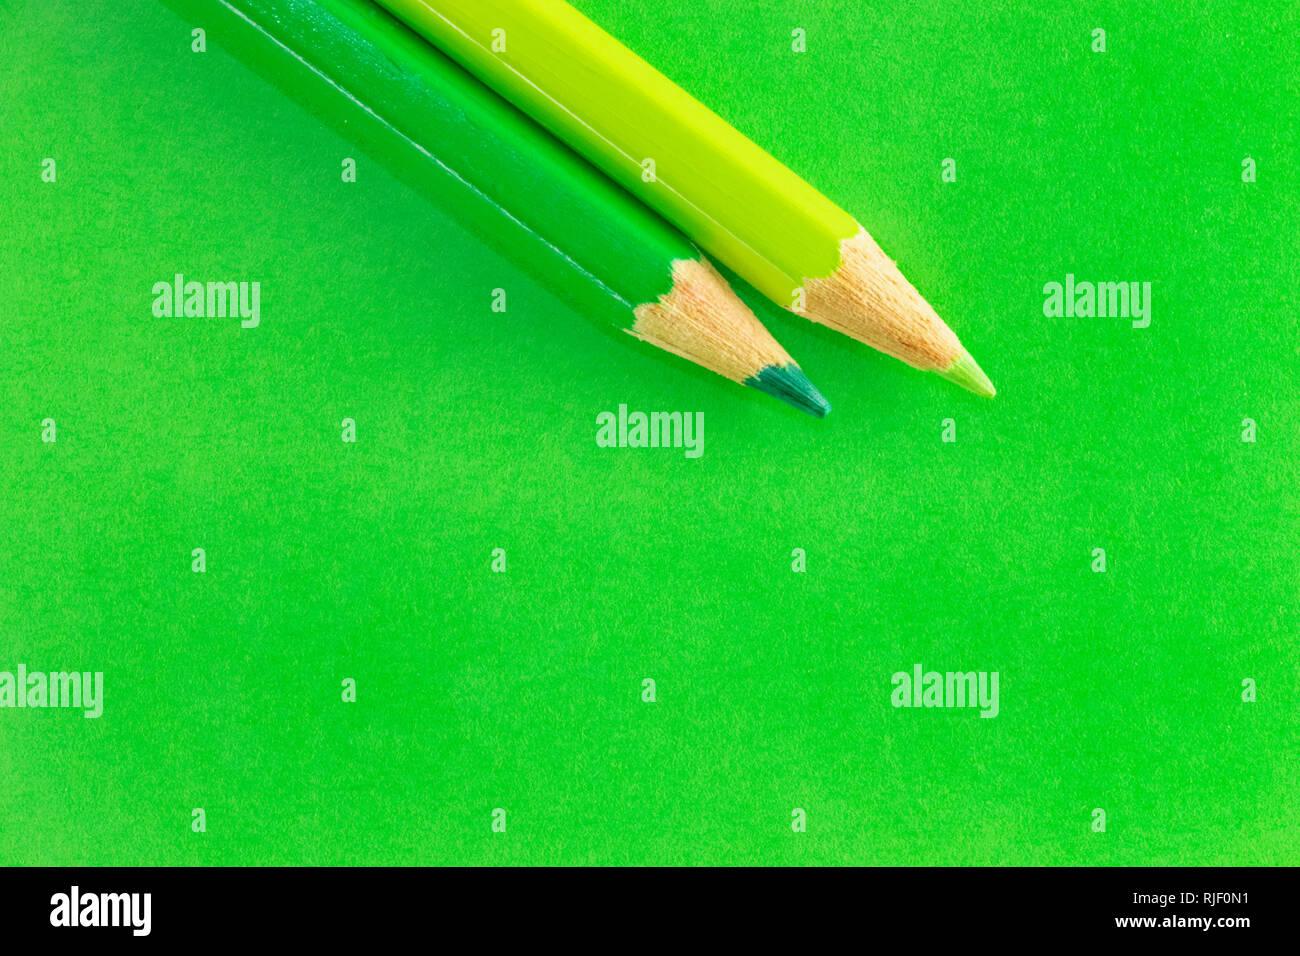 Beautiful Colored Pencils Stock Photos Amp Beautiful Colored Pencils Stock Images